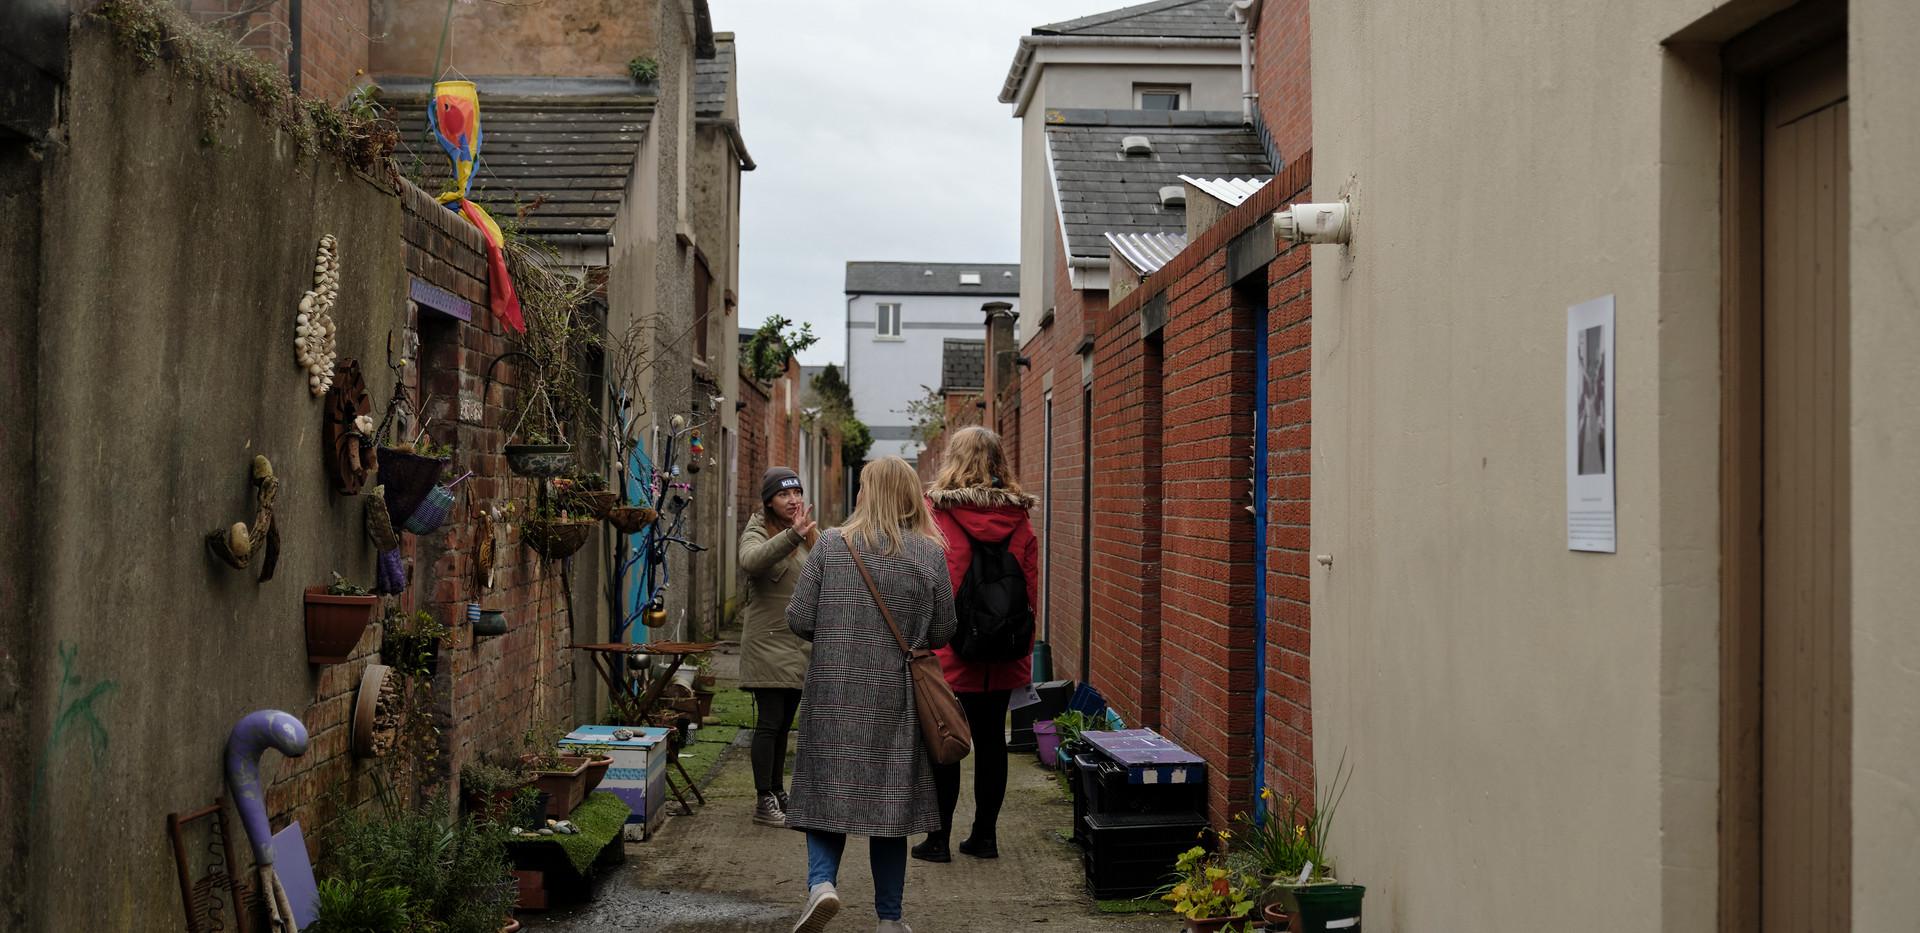 20210325 Limin Alley 360.jpg